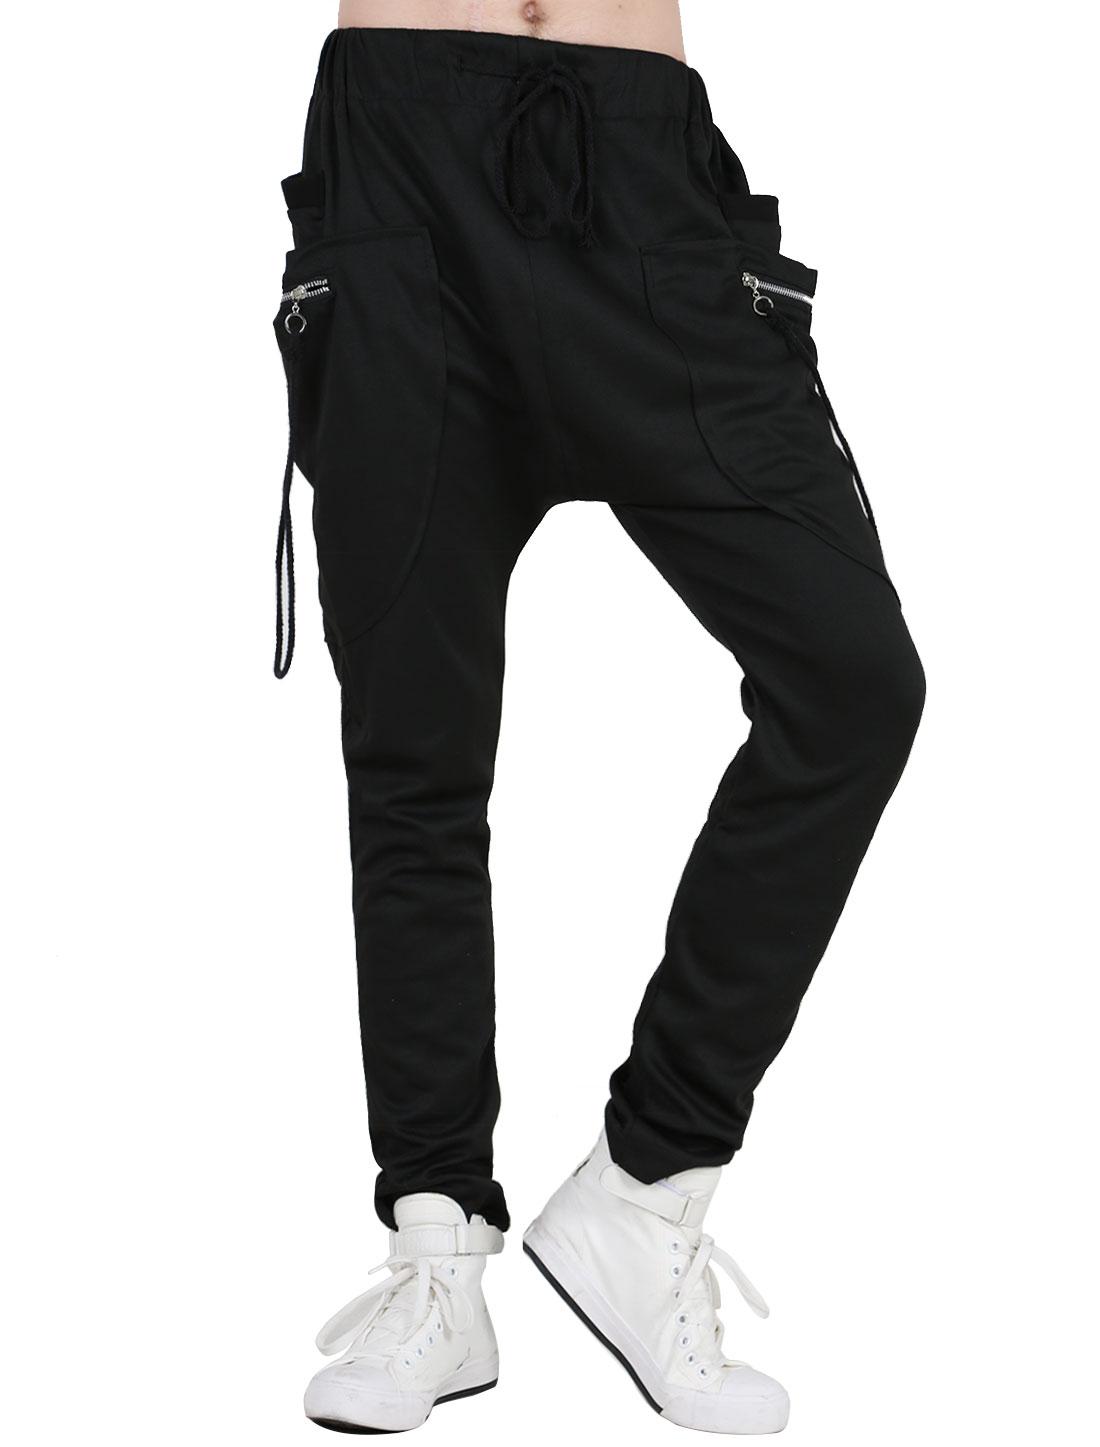 Mens Fashion Solid Black Zippers Decor Self Tie String Pants W36/38